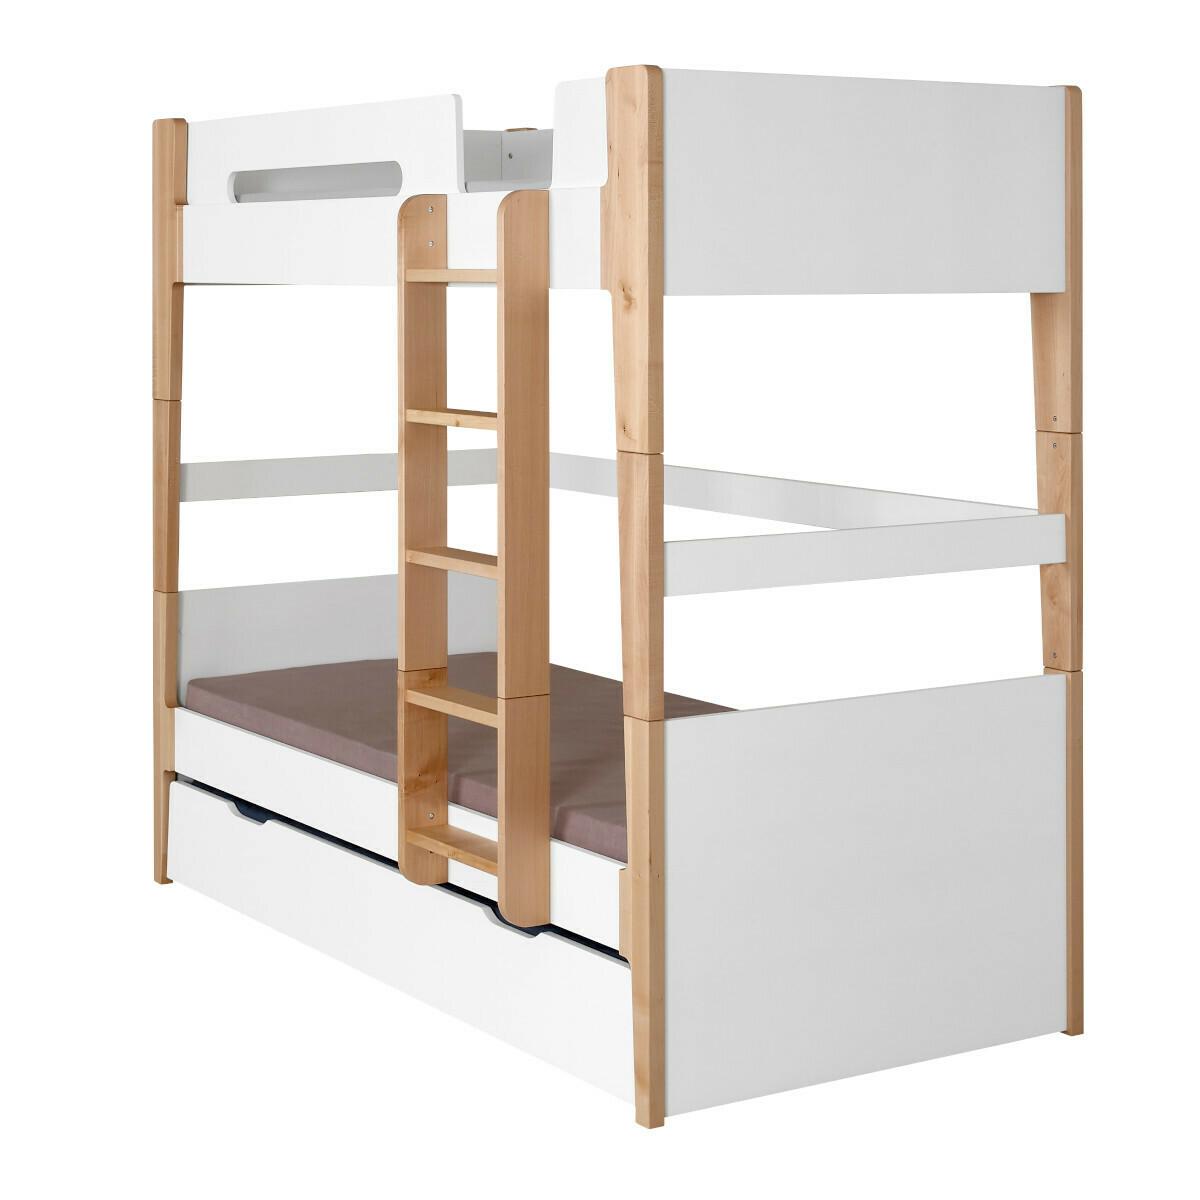 Lit superposé modulable gigogne Bois massif, MDF 90x190 Blanc, bois